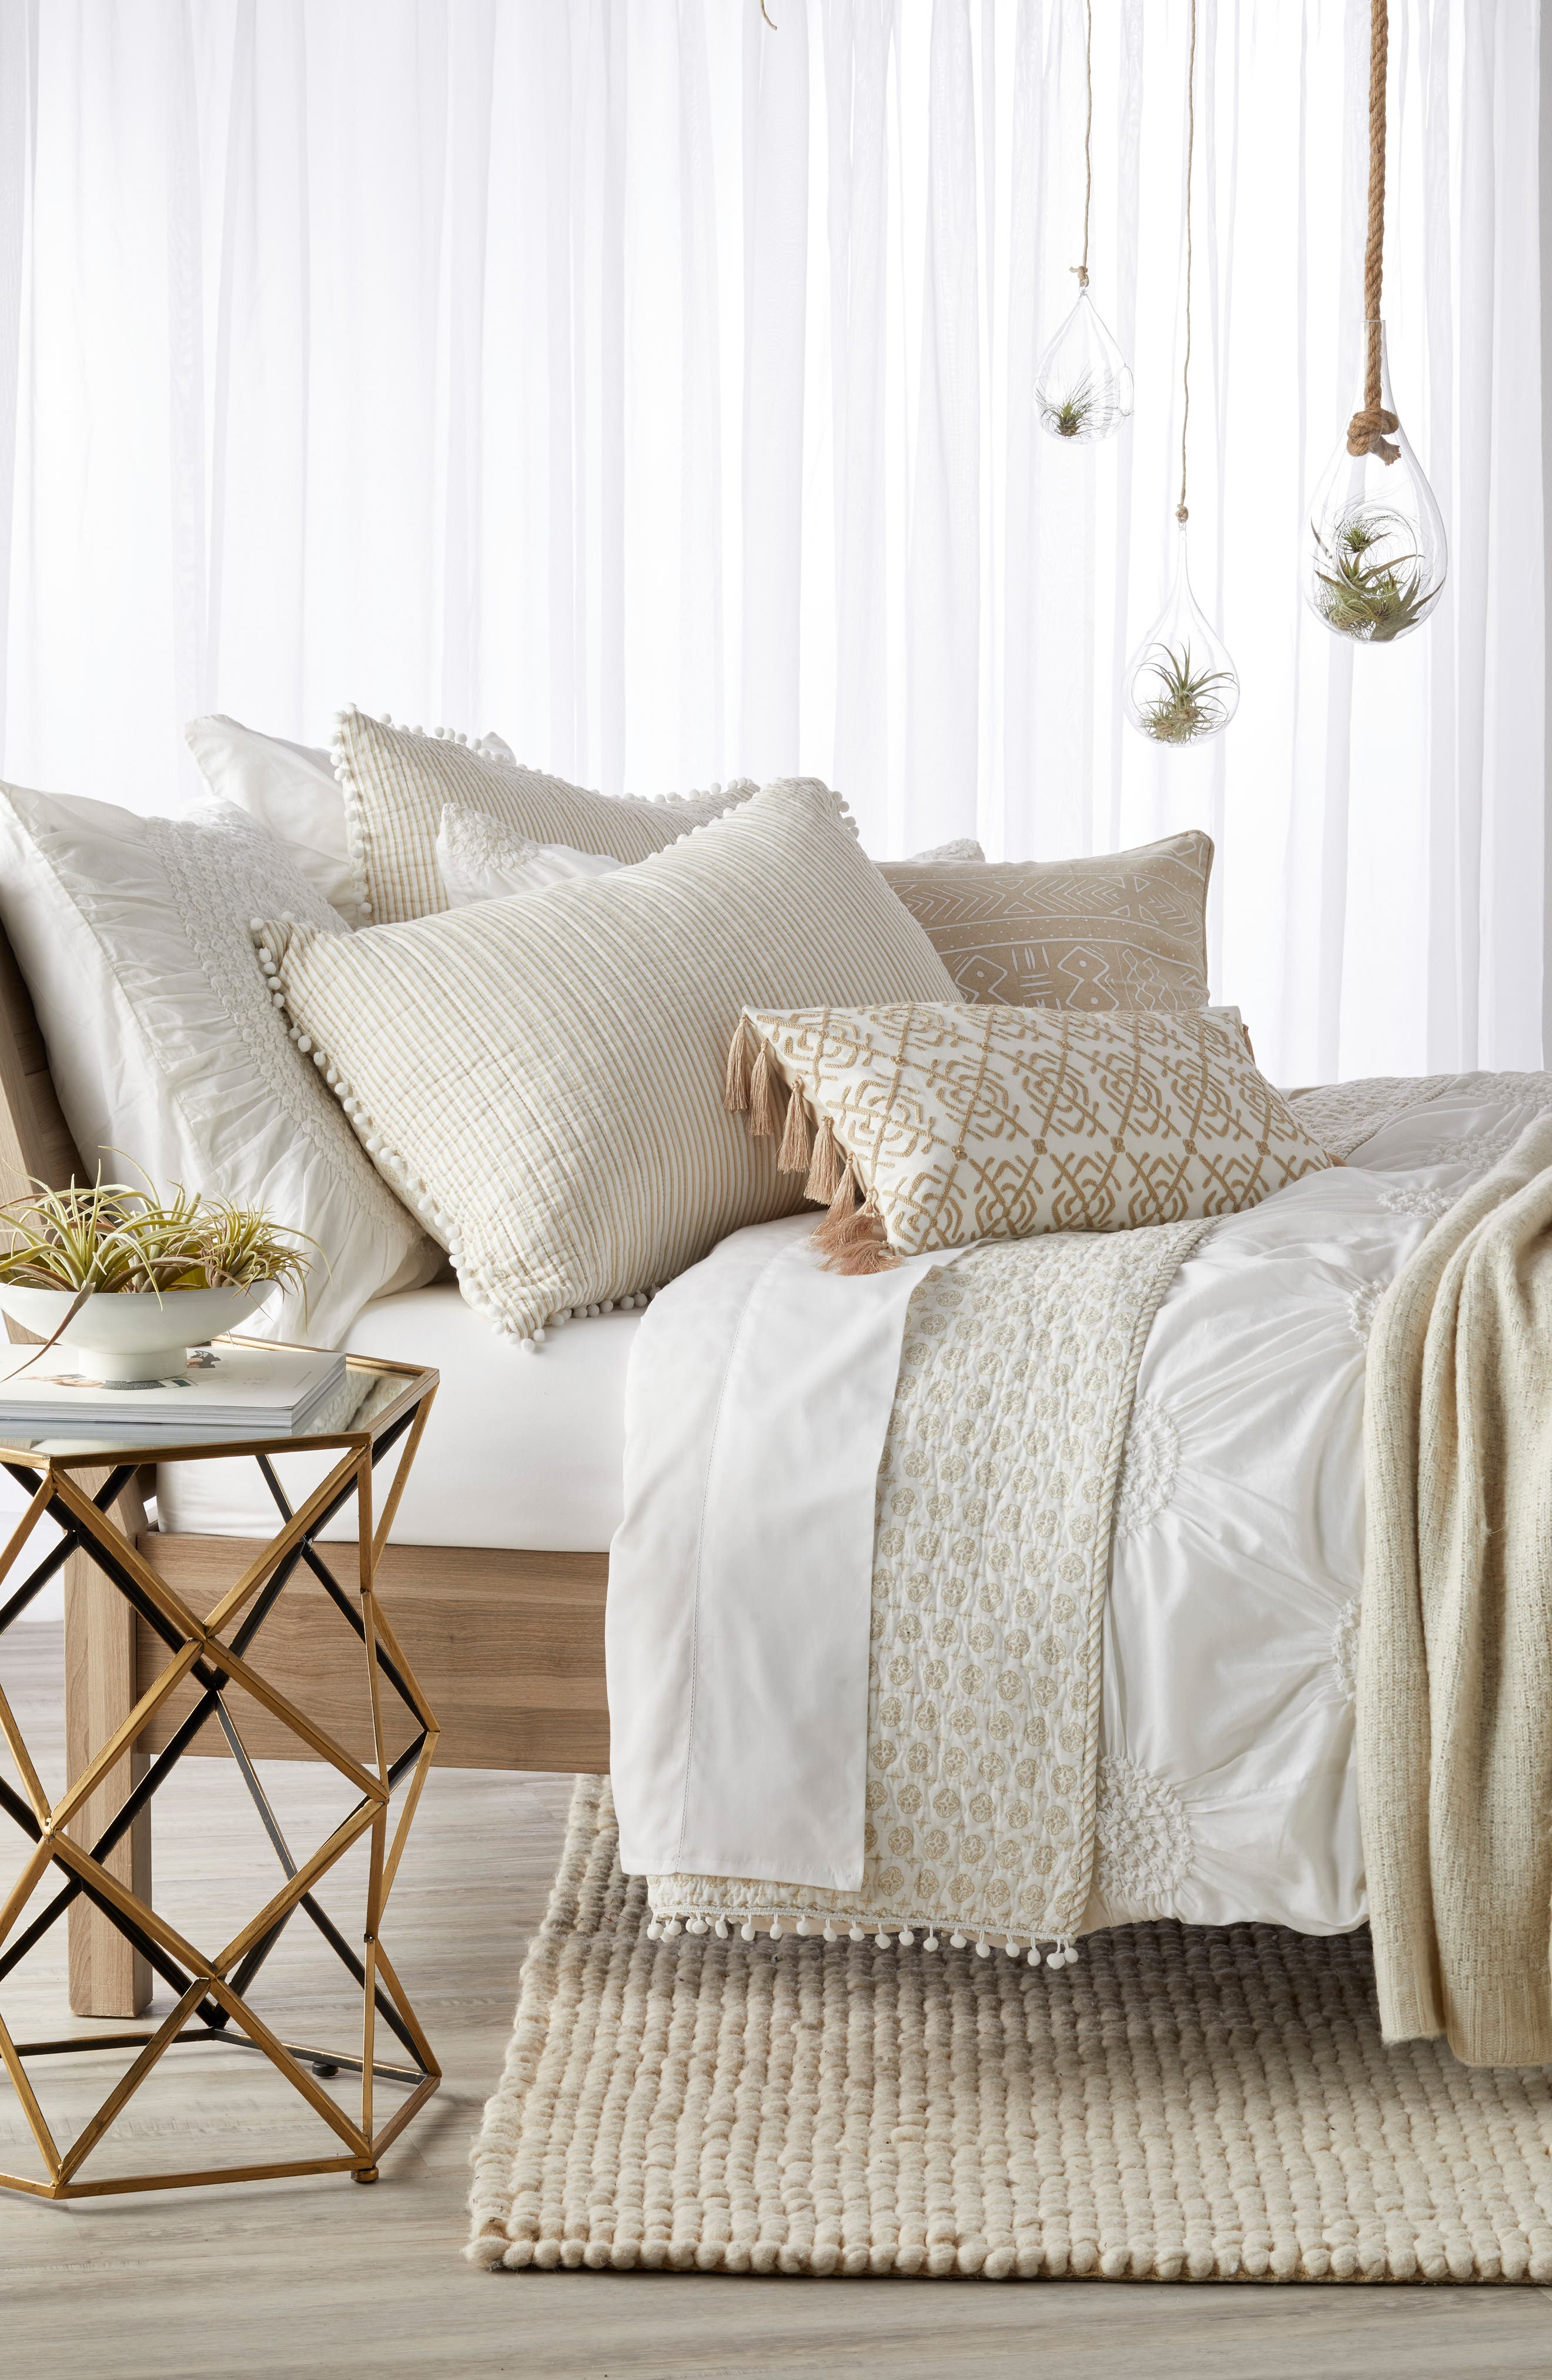 Nordstrom at Home 'Chloe' Duvet & Levtex Bedford Quilt Bedding Collection